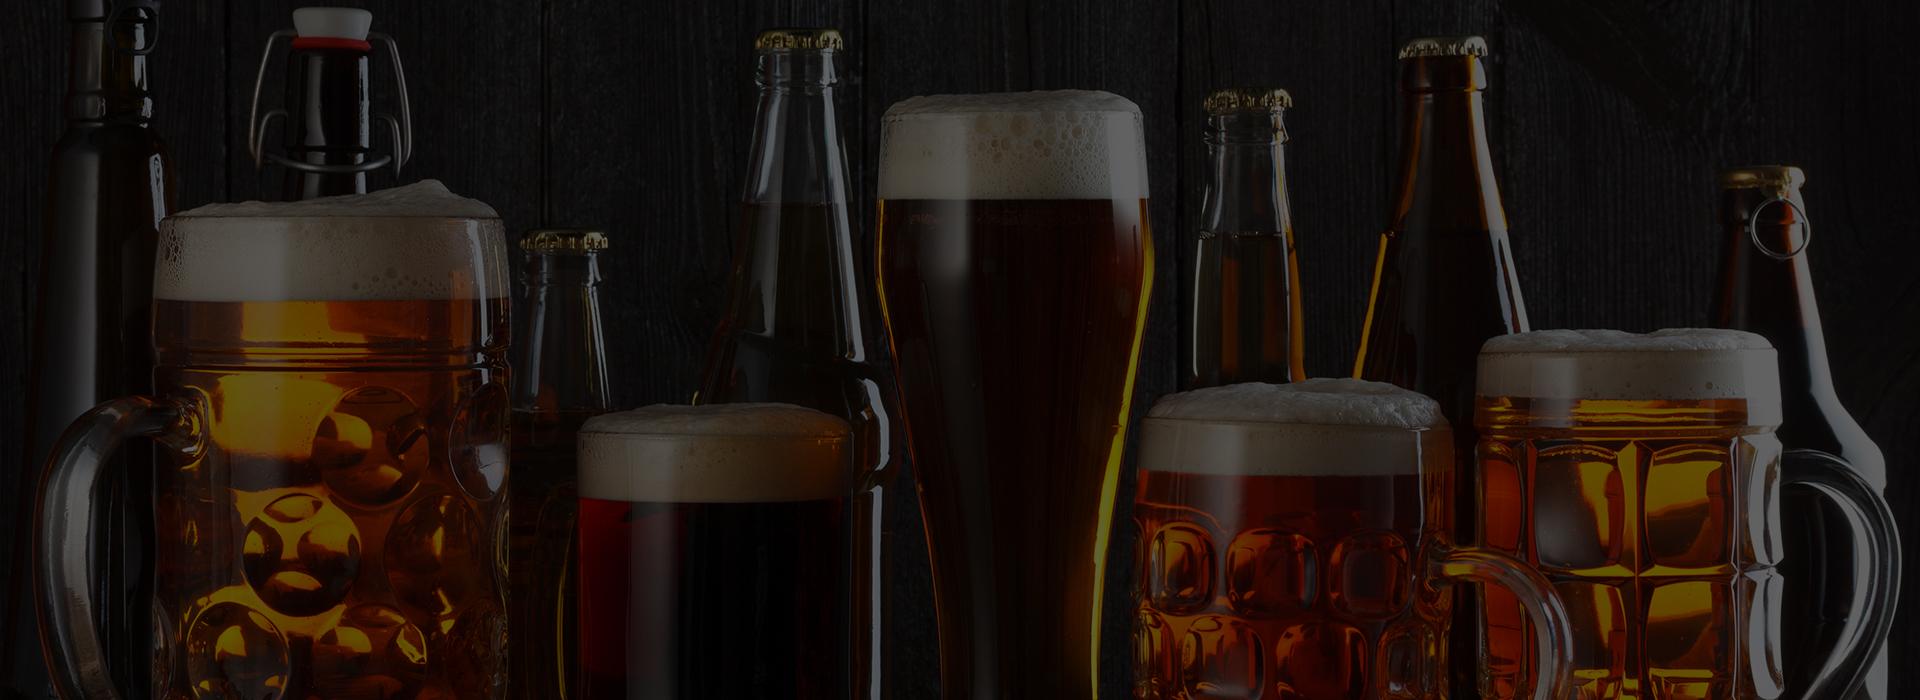 Birre Maracanà Pub